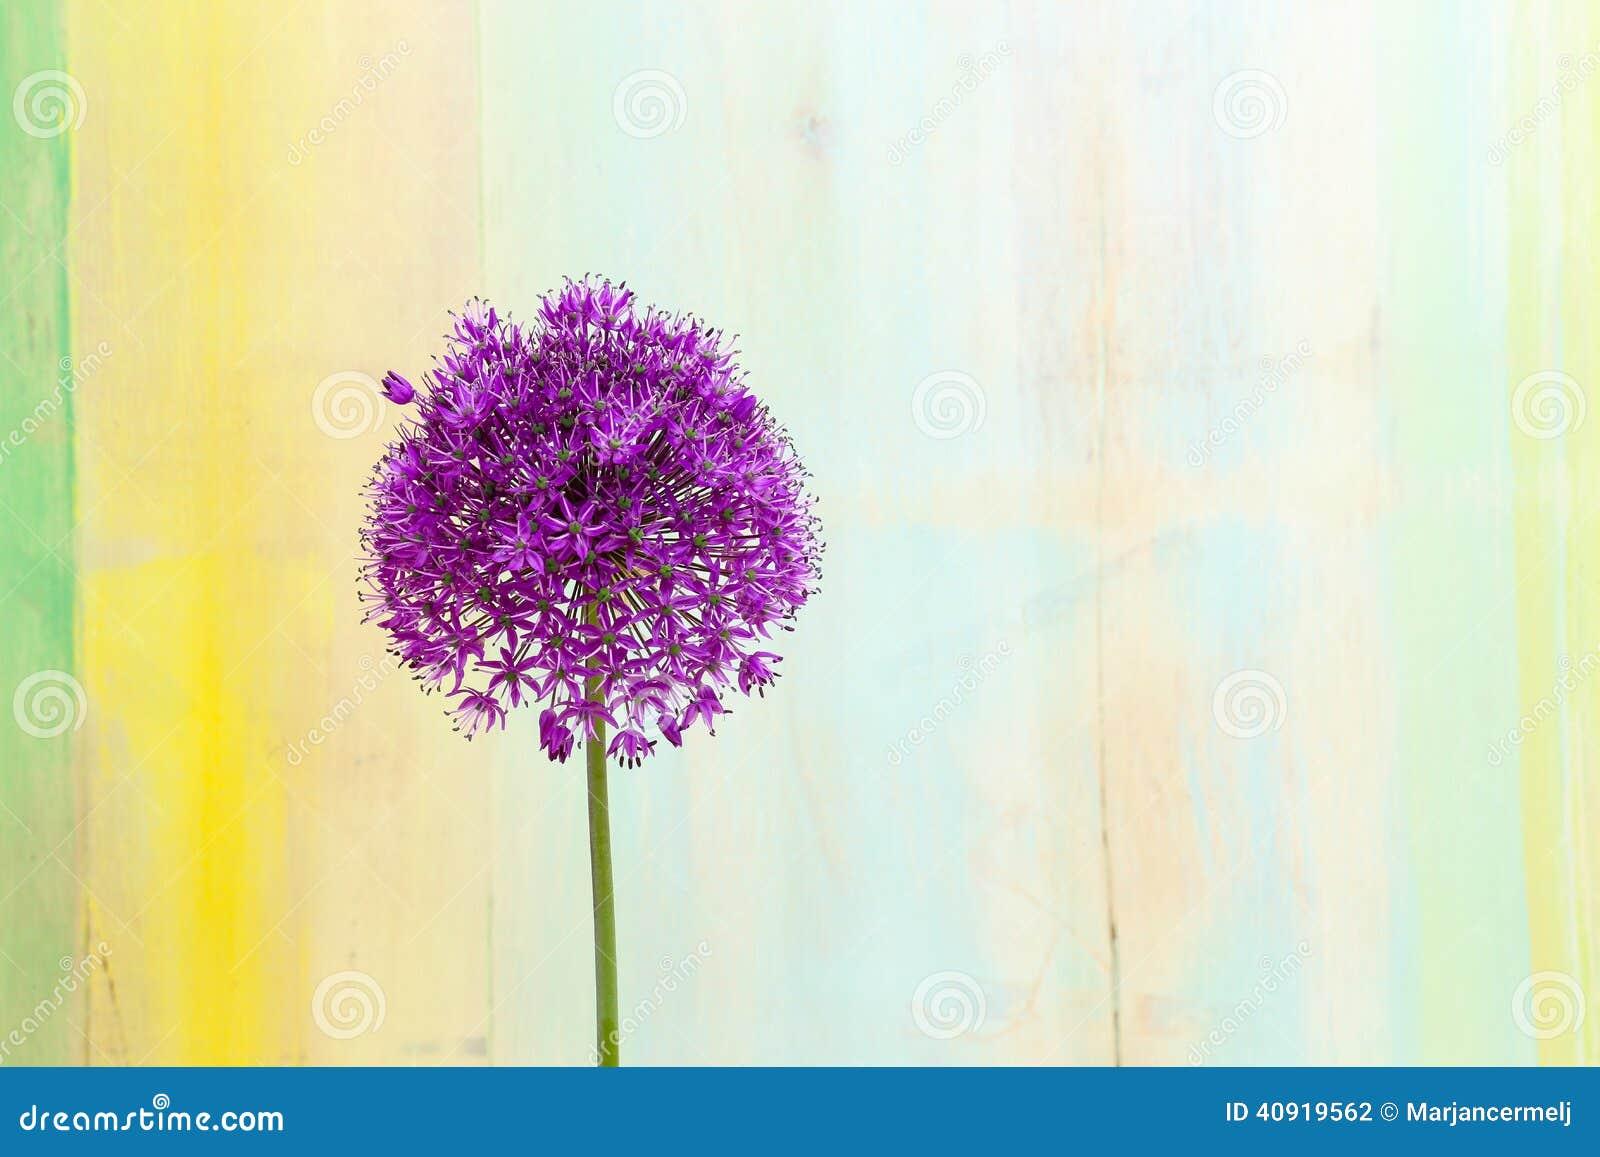 Allium Ornamental Onion Violet Showy Flower Head Stock Photo Image